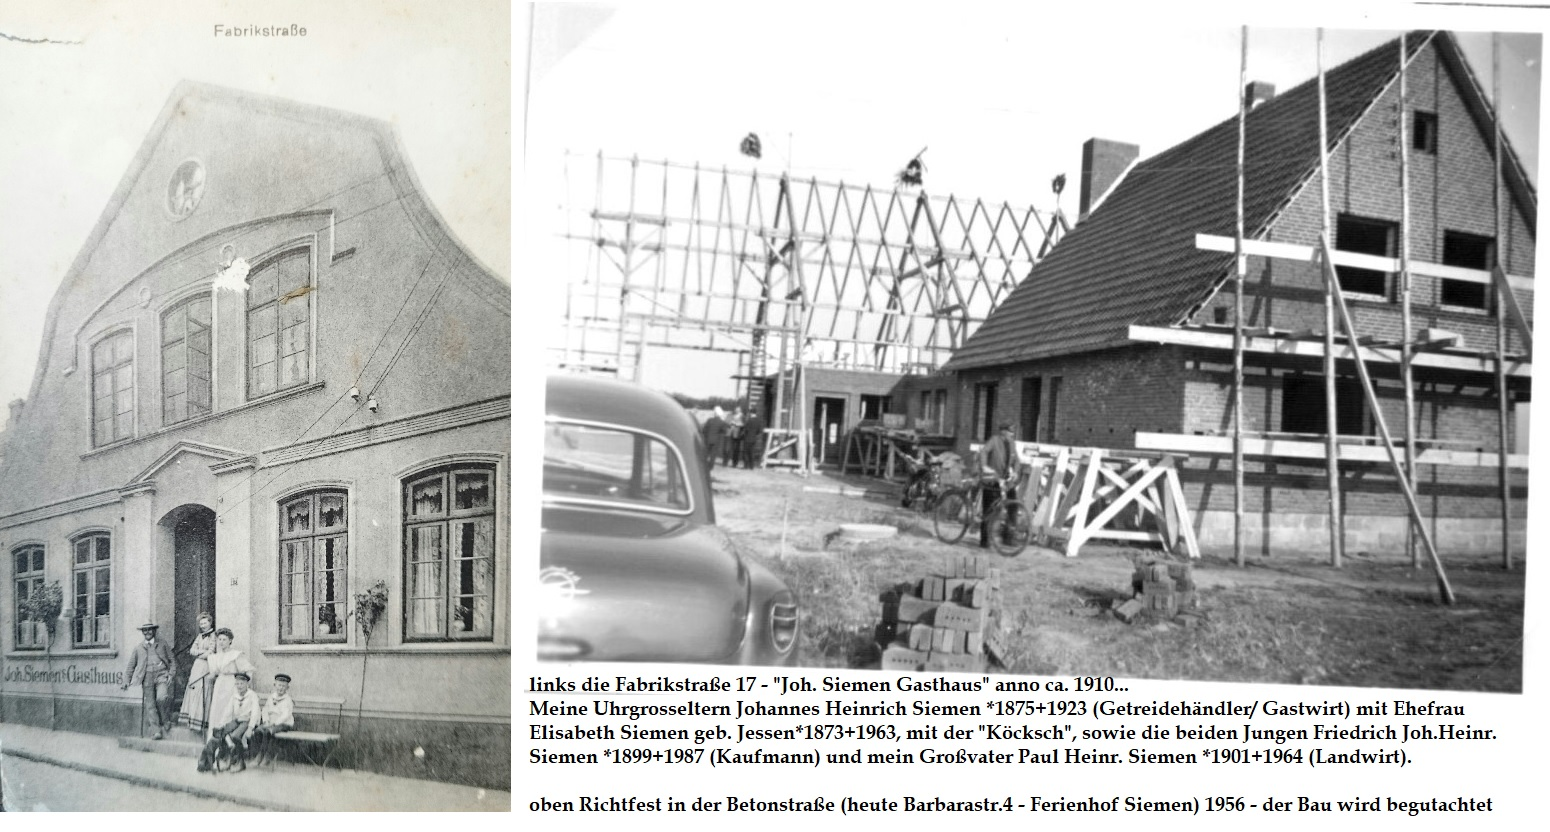 1910-Fabrikstrasse-17-und-1956-Betonstrasse-bzw.-Barbarastr.-4